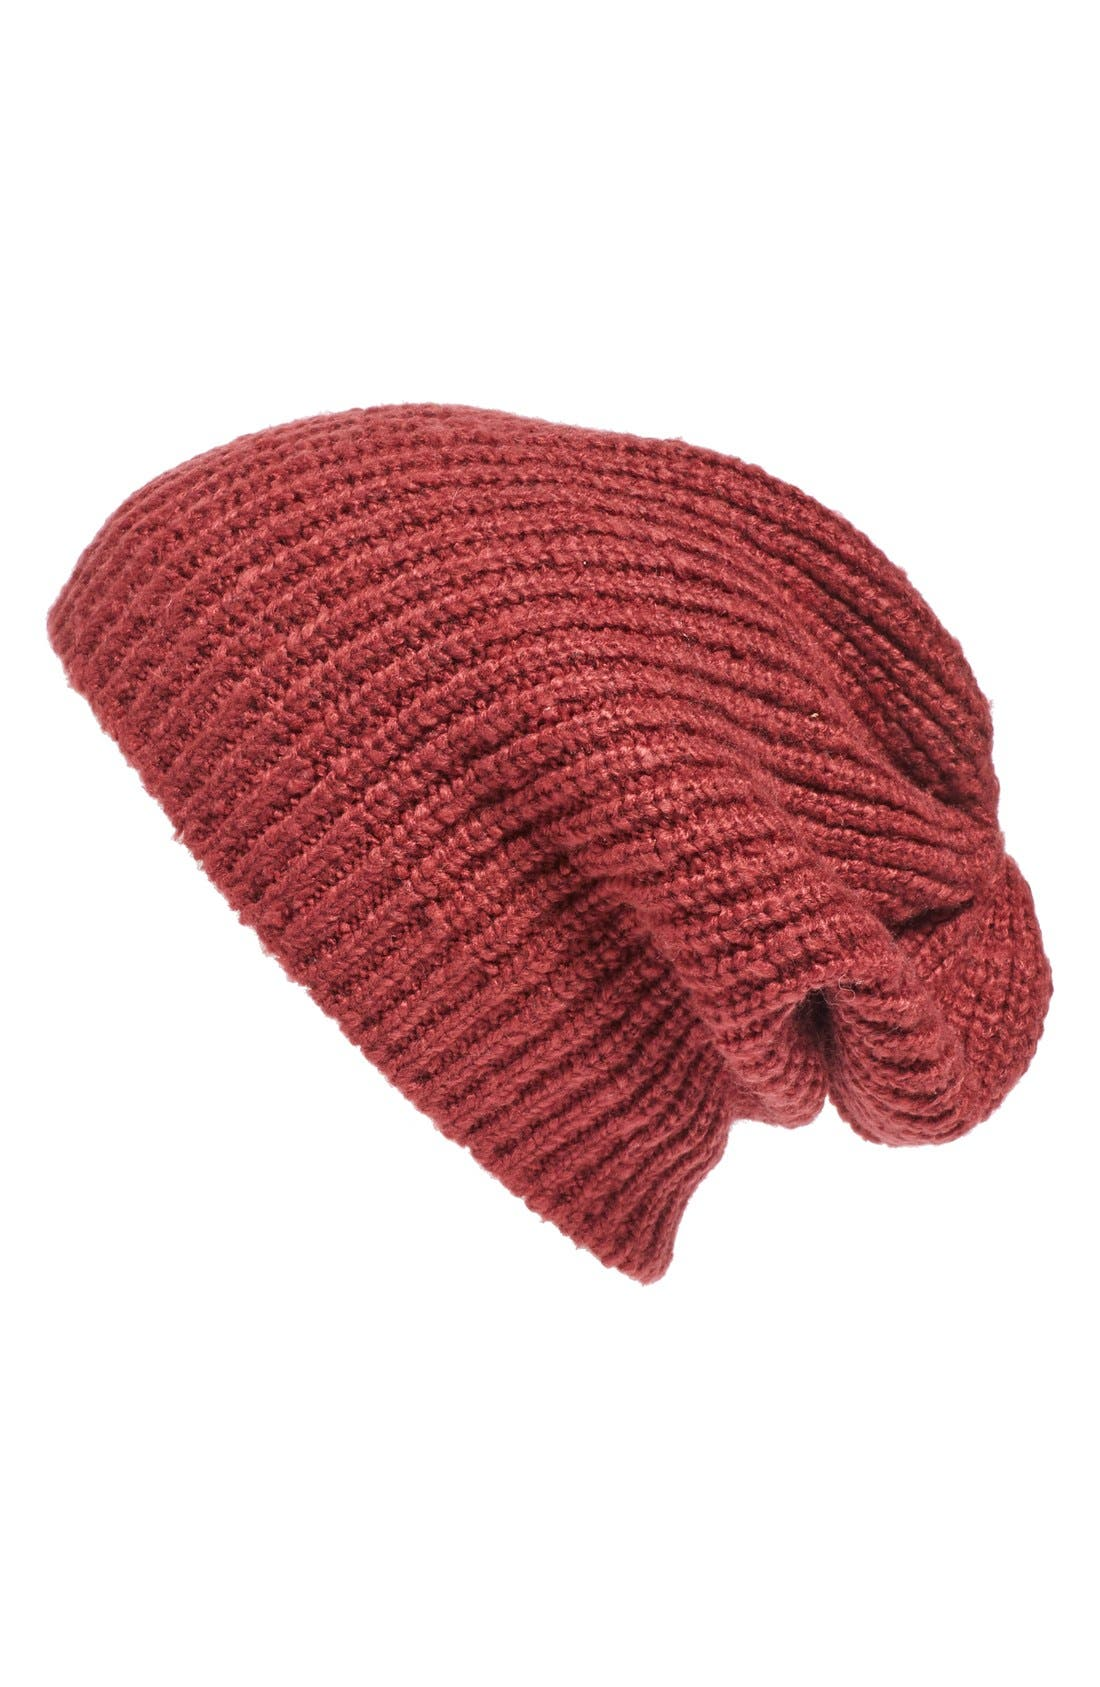 Alternate Image 1 Selected - Caslon® 'Coordin' Knit Beanie